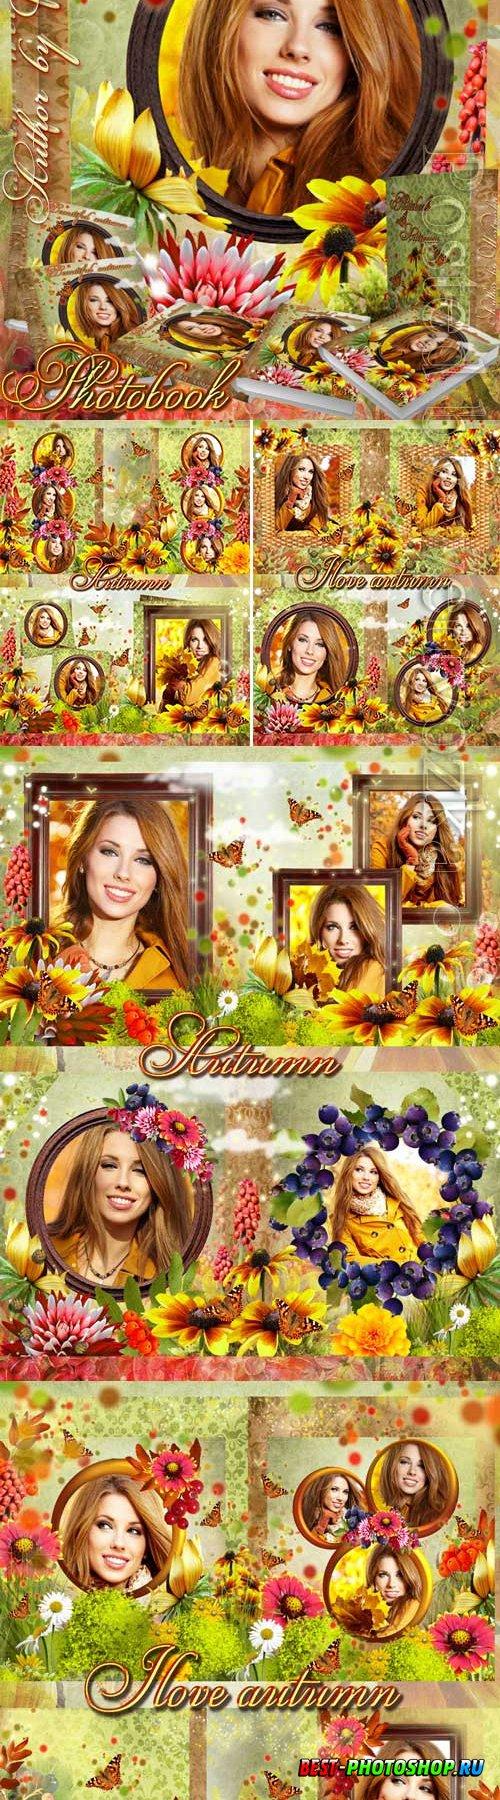 Beautiful autumn photo album